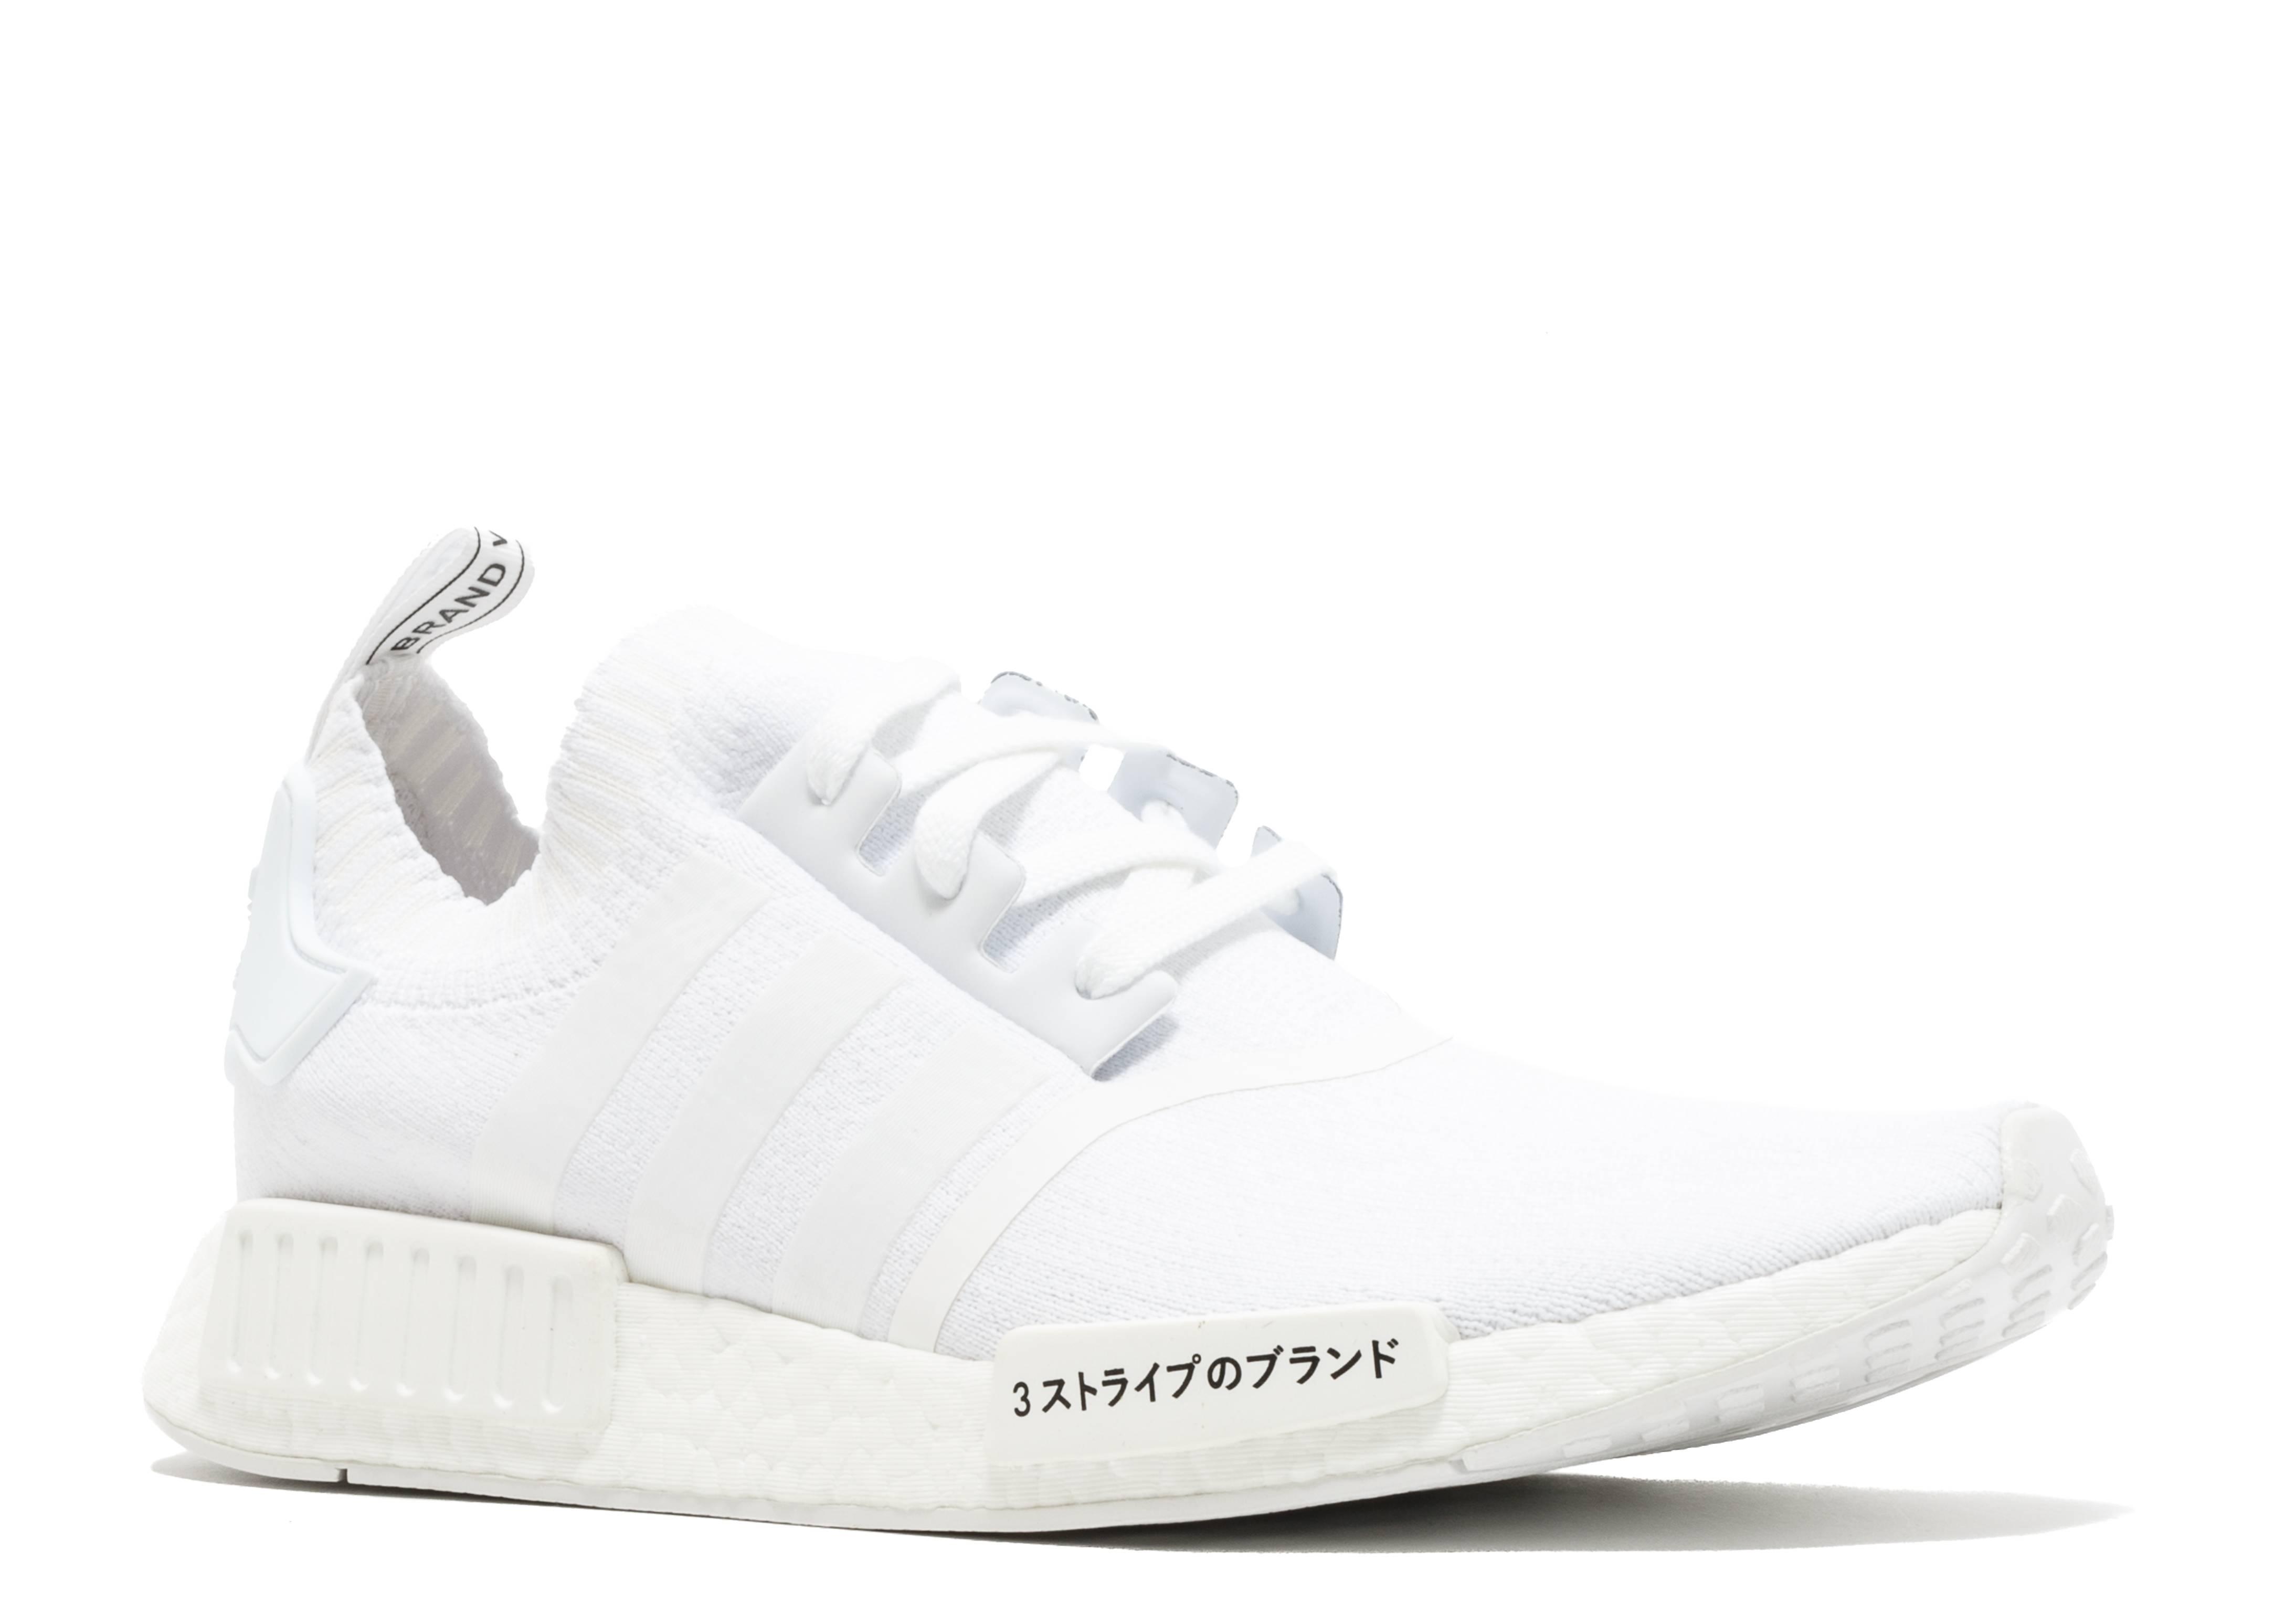 c9954a056 Adidas NMD R1 Japan Triple White - 1